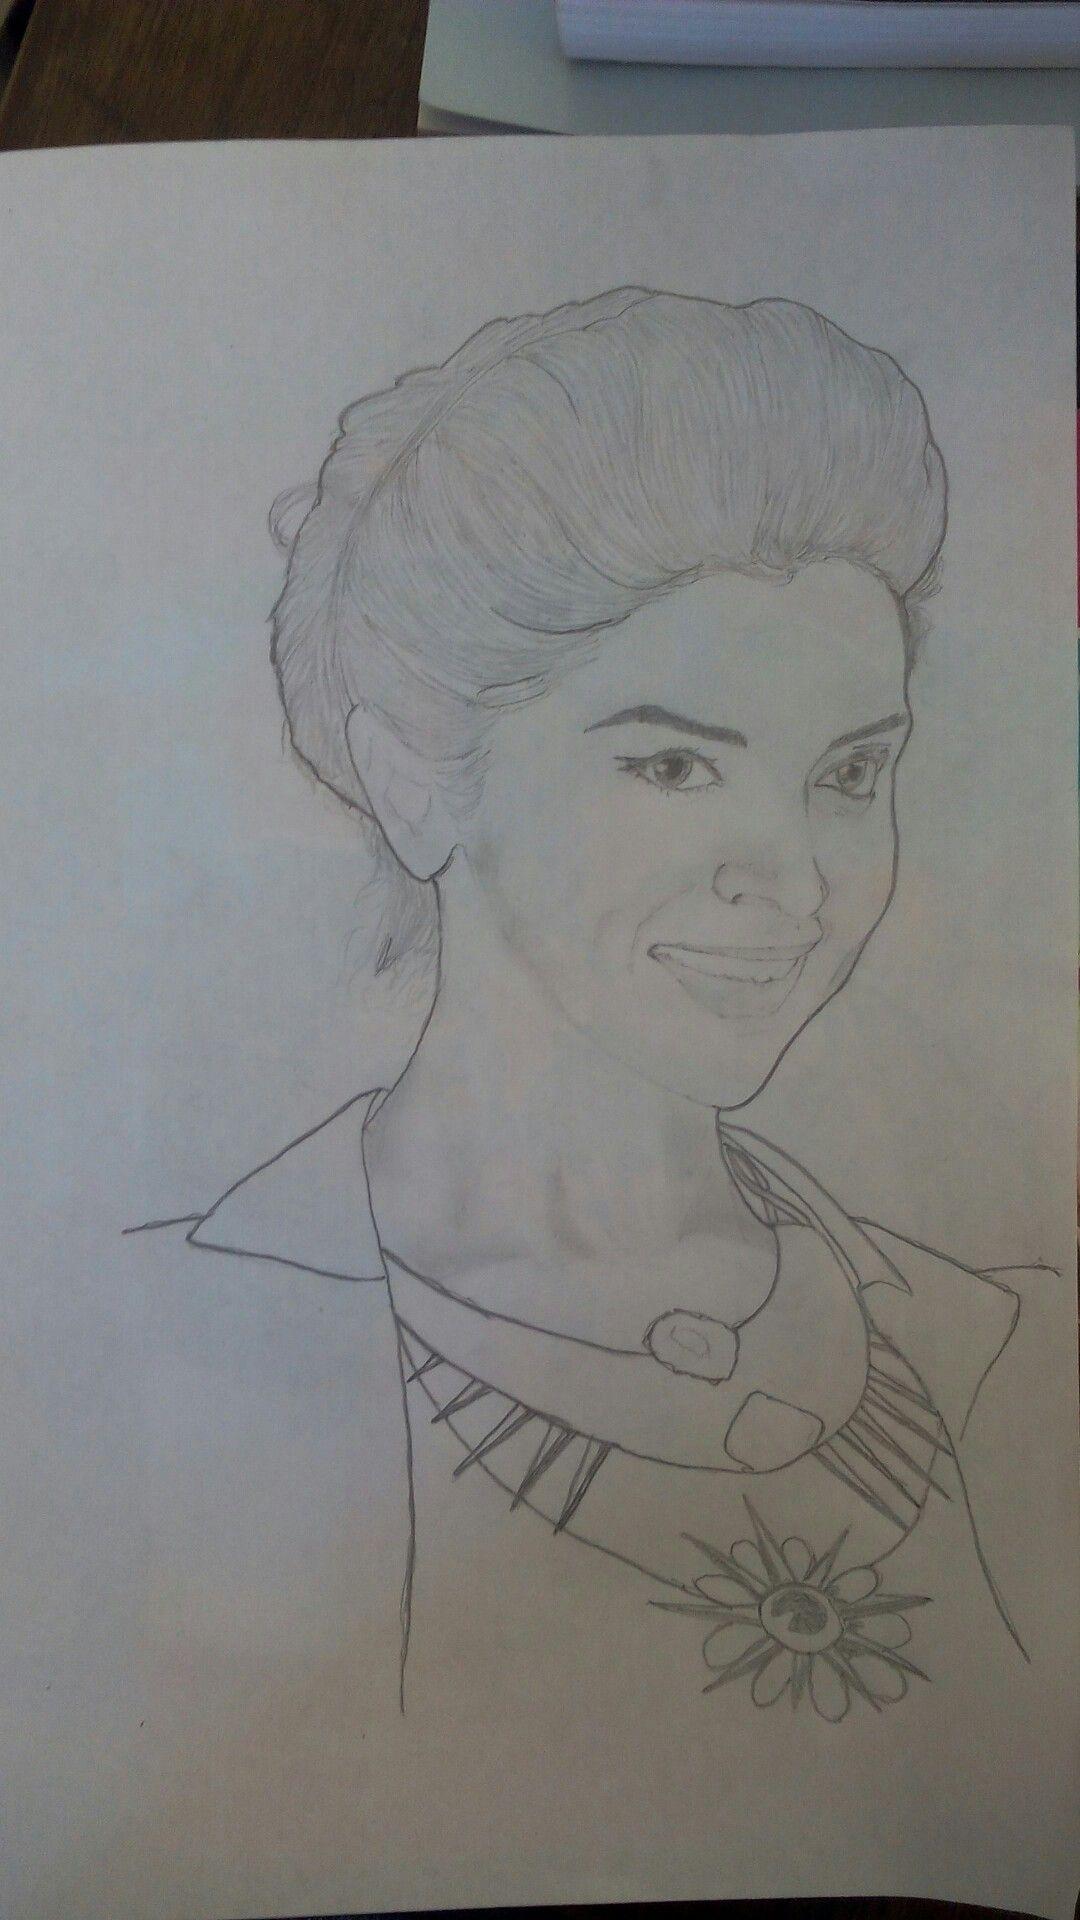 Deepika Padukone, Sketch, Pencil | Cool pencil drawings ...